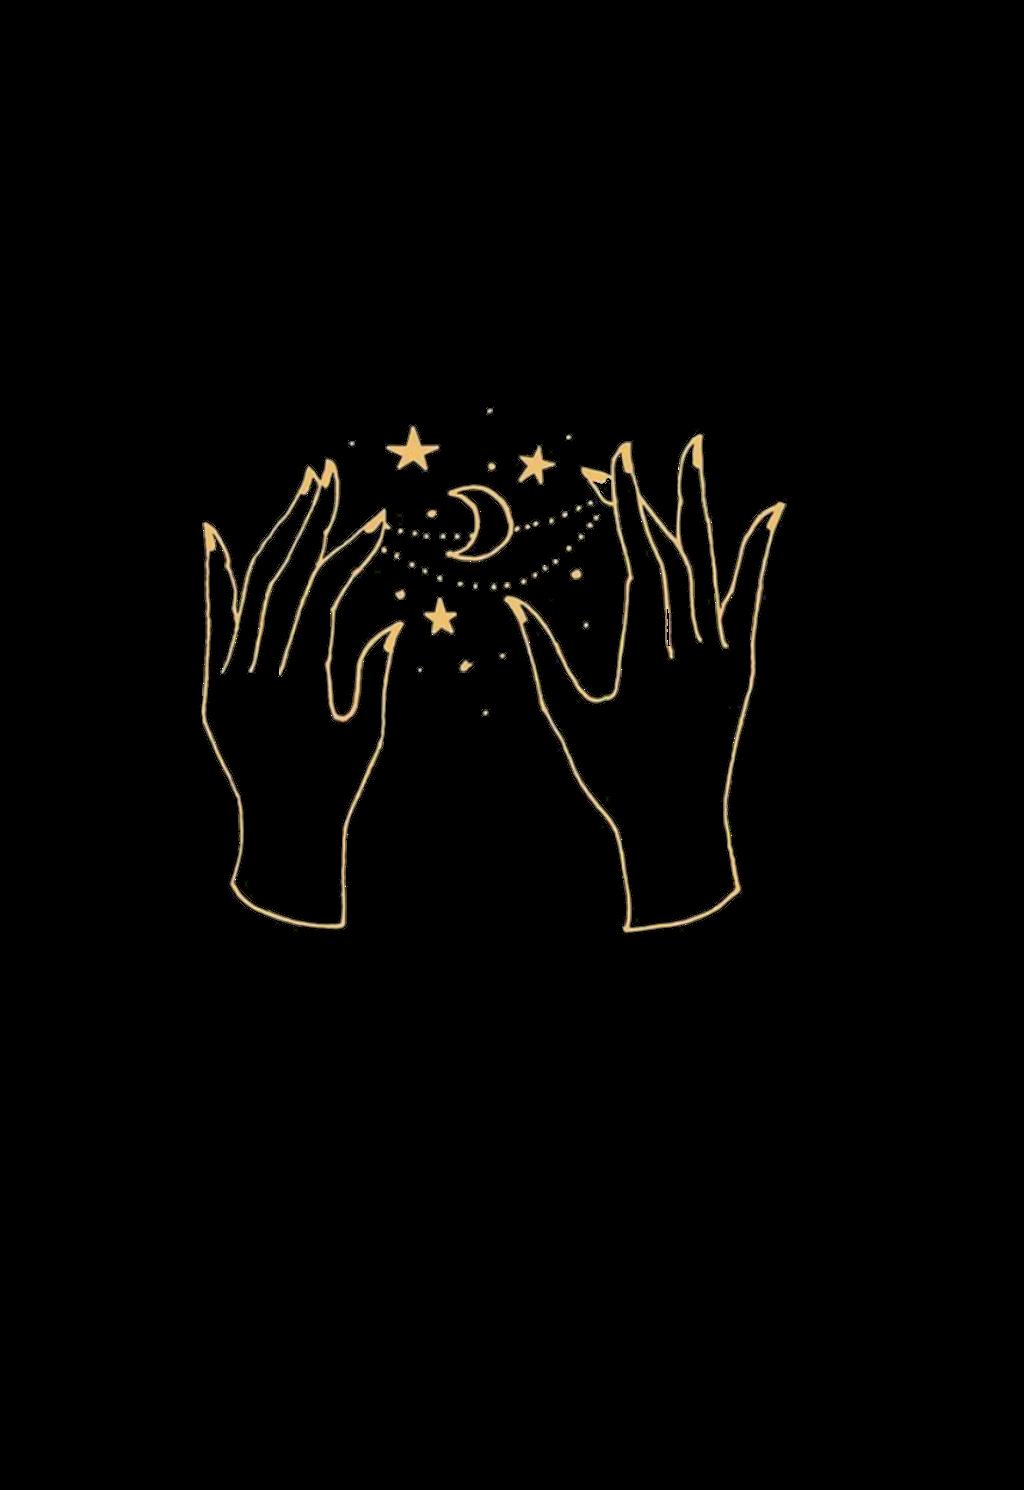 Aesthetic Clipart Hands 12 1024 X 1490 Aesthetic Drawing Magic Aesthetic Modern Magic